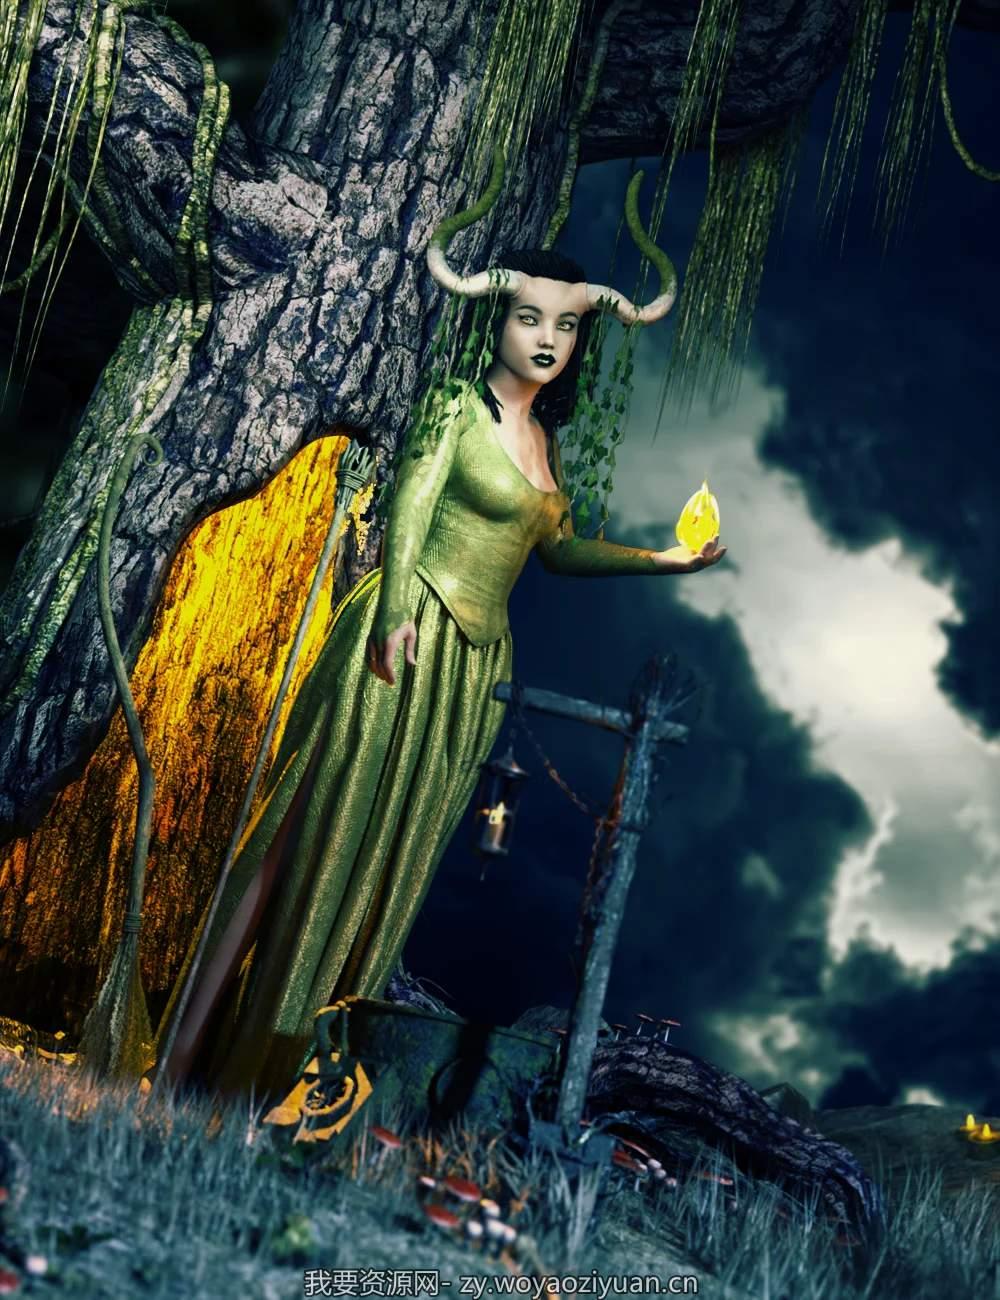 Arcane Enchantress Appurtenances for Genesis 8 Female